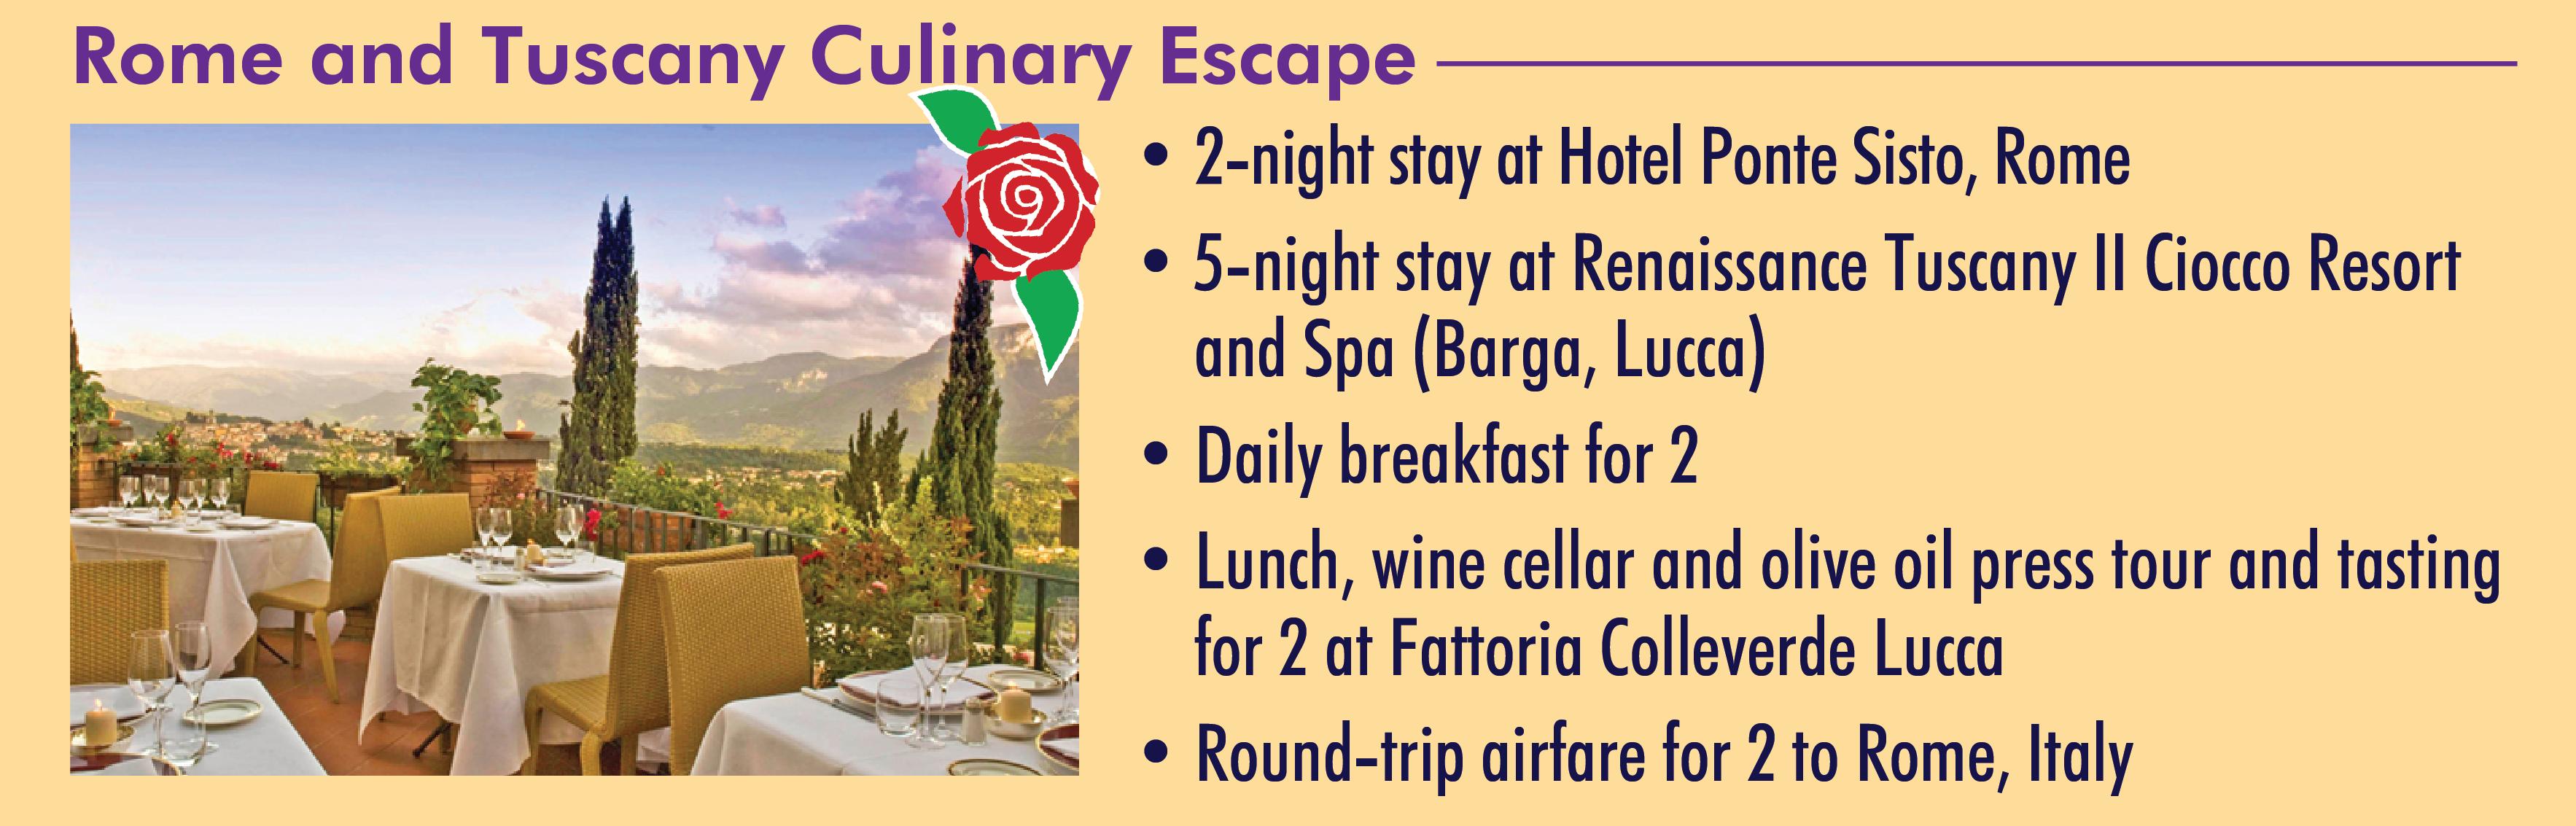 Rome and Tuscany Culinary Escape